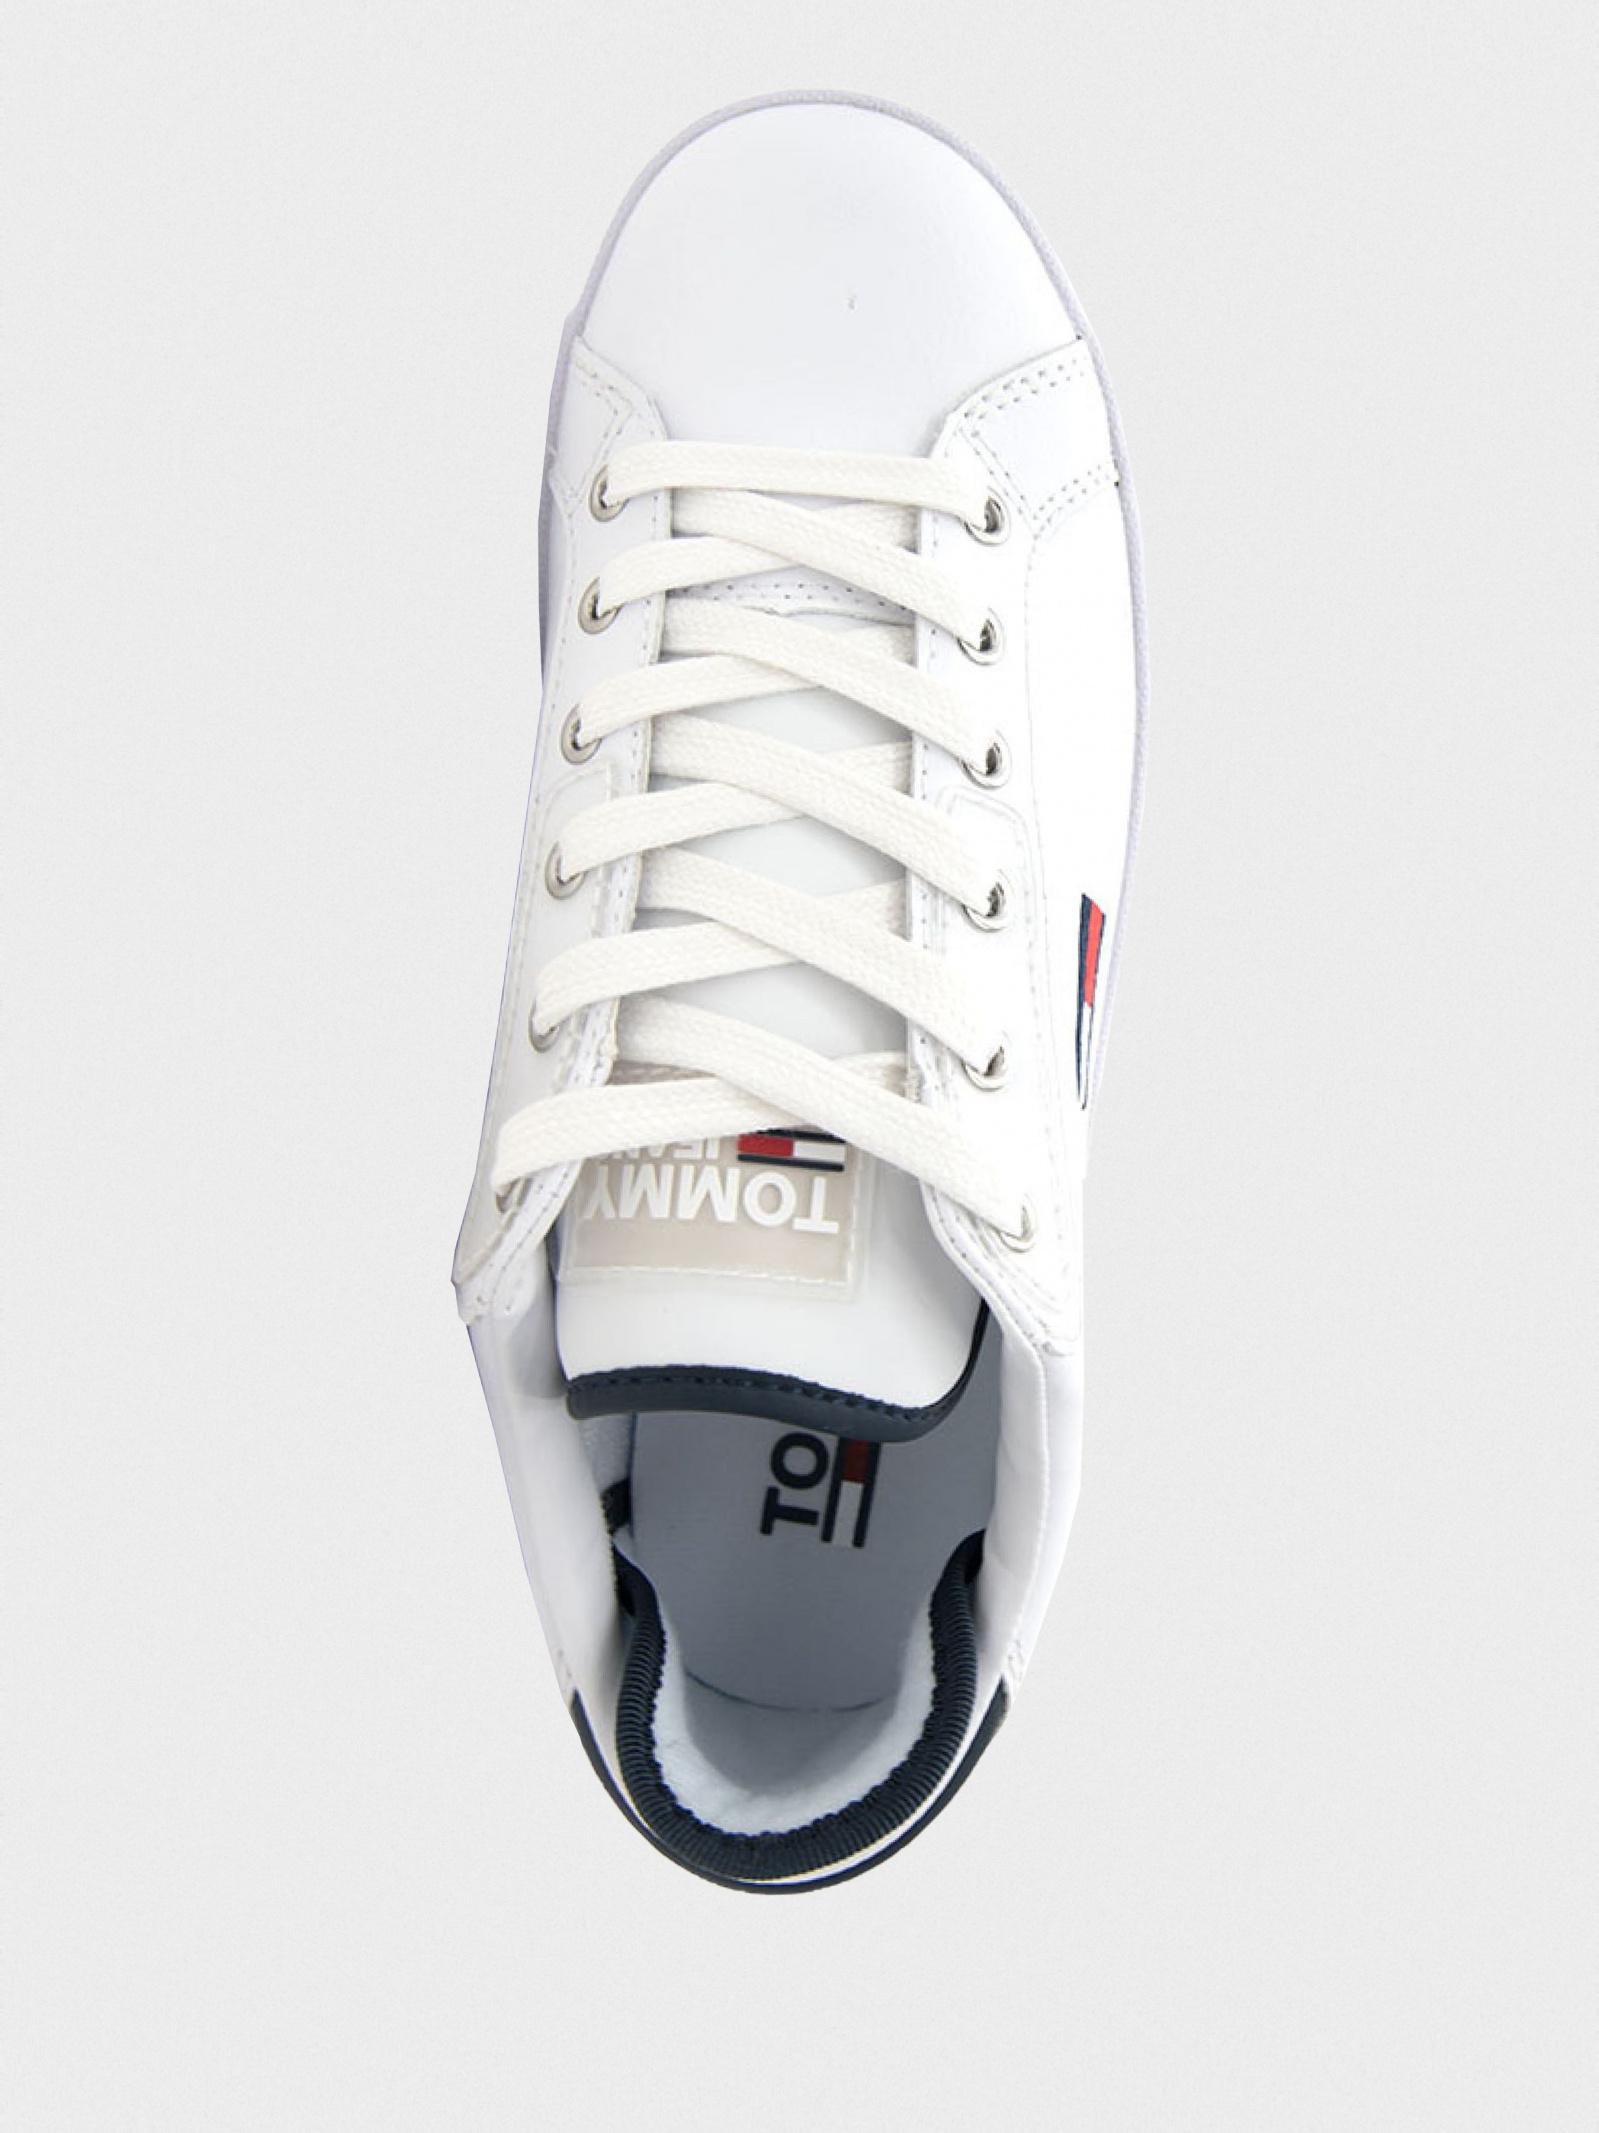 Полуботинки для женщин Tommy Hilfiger TOMMY JEANS TD1417 размерная сетка обуви, 2017